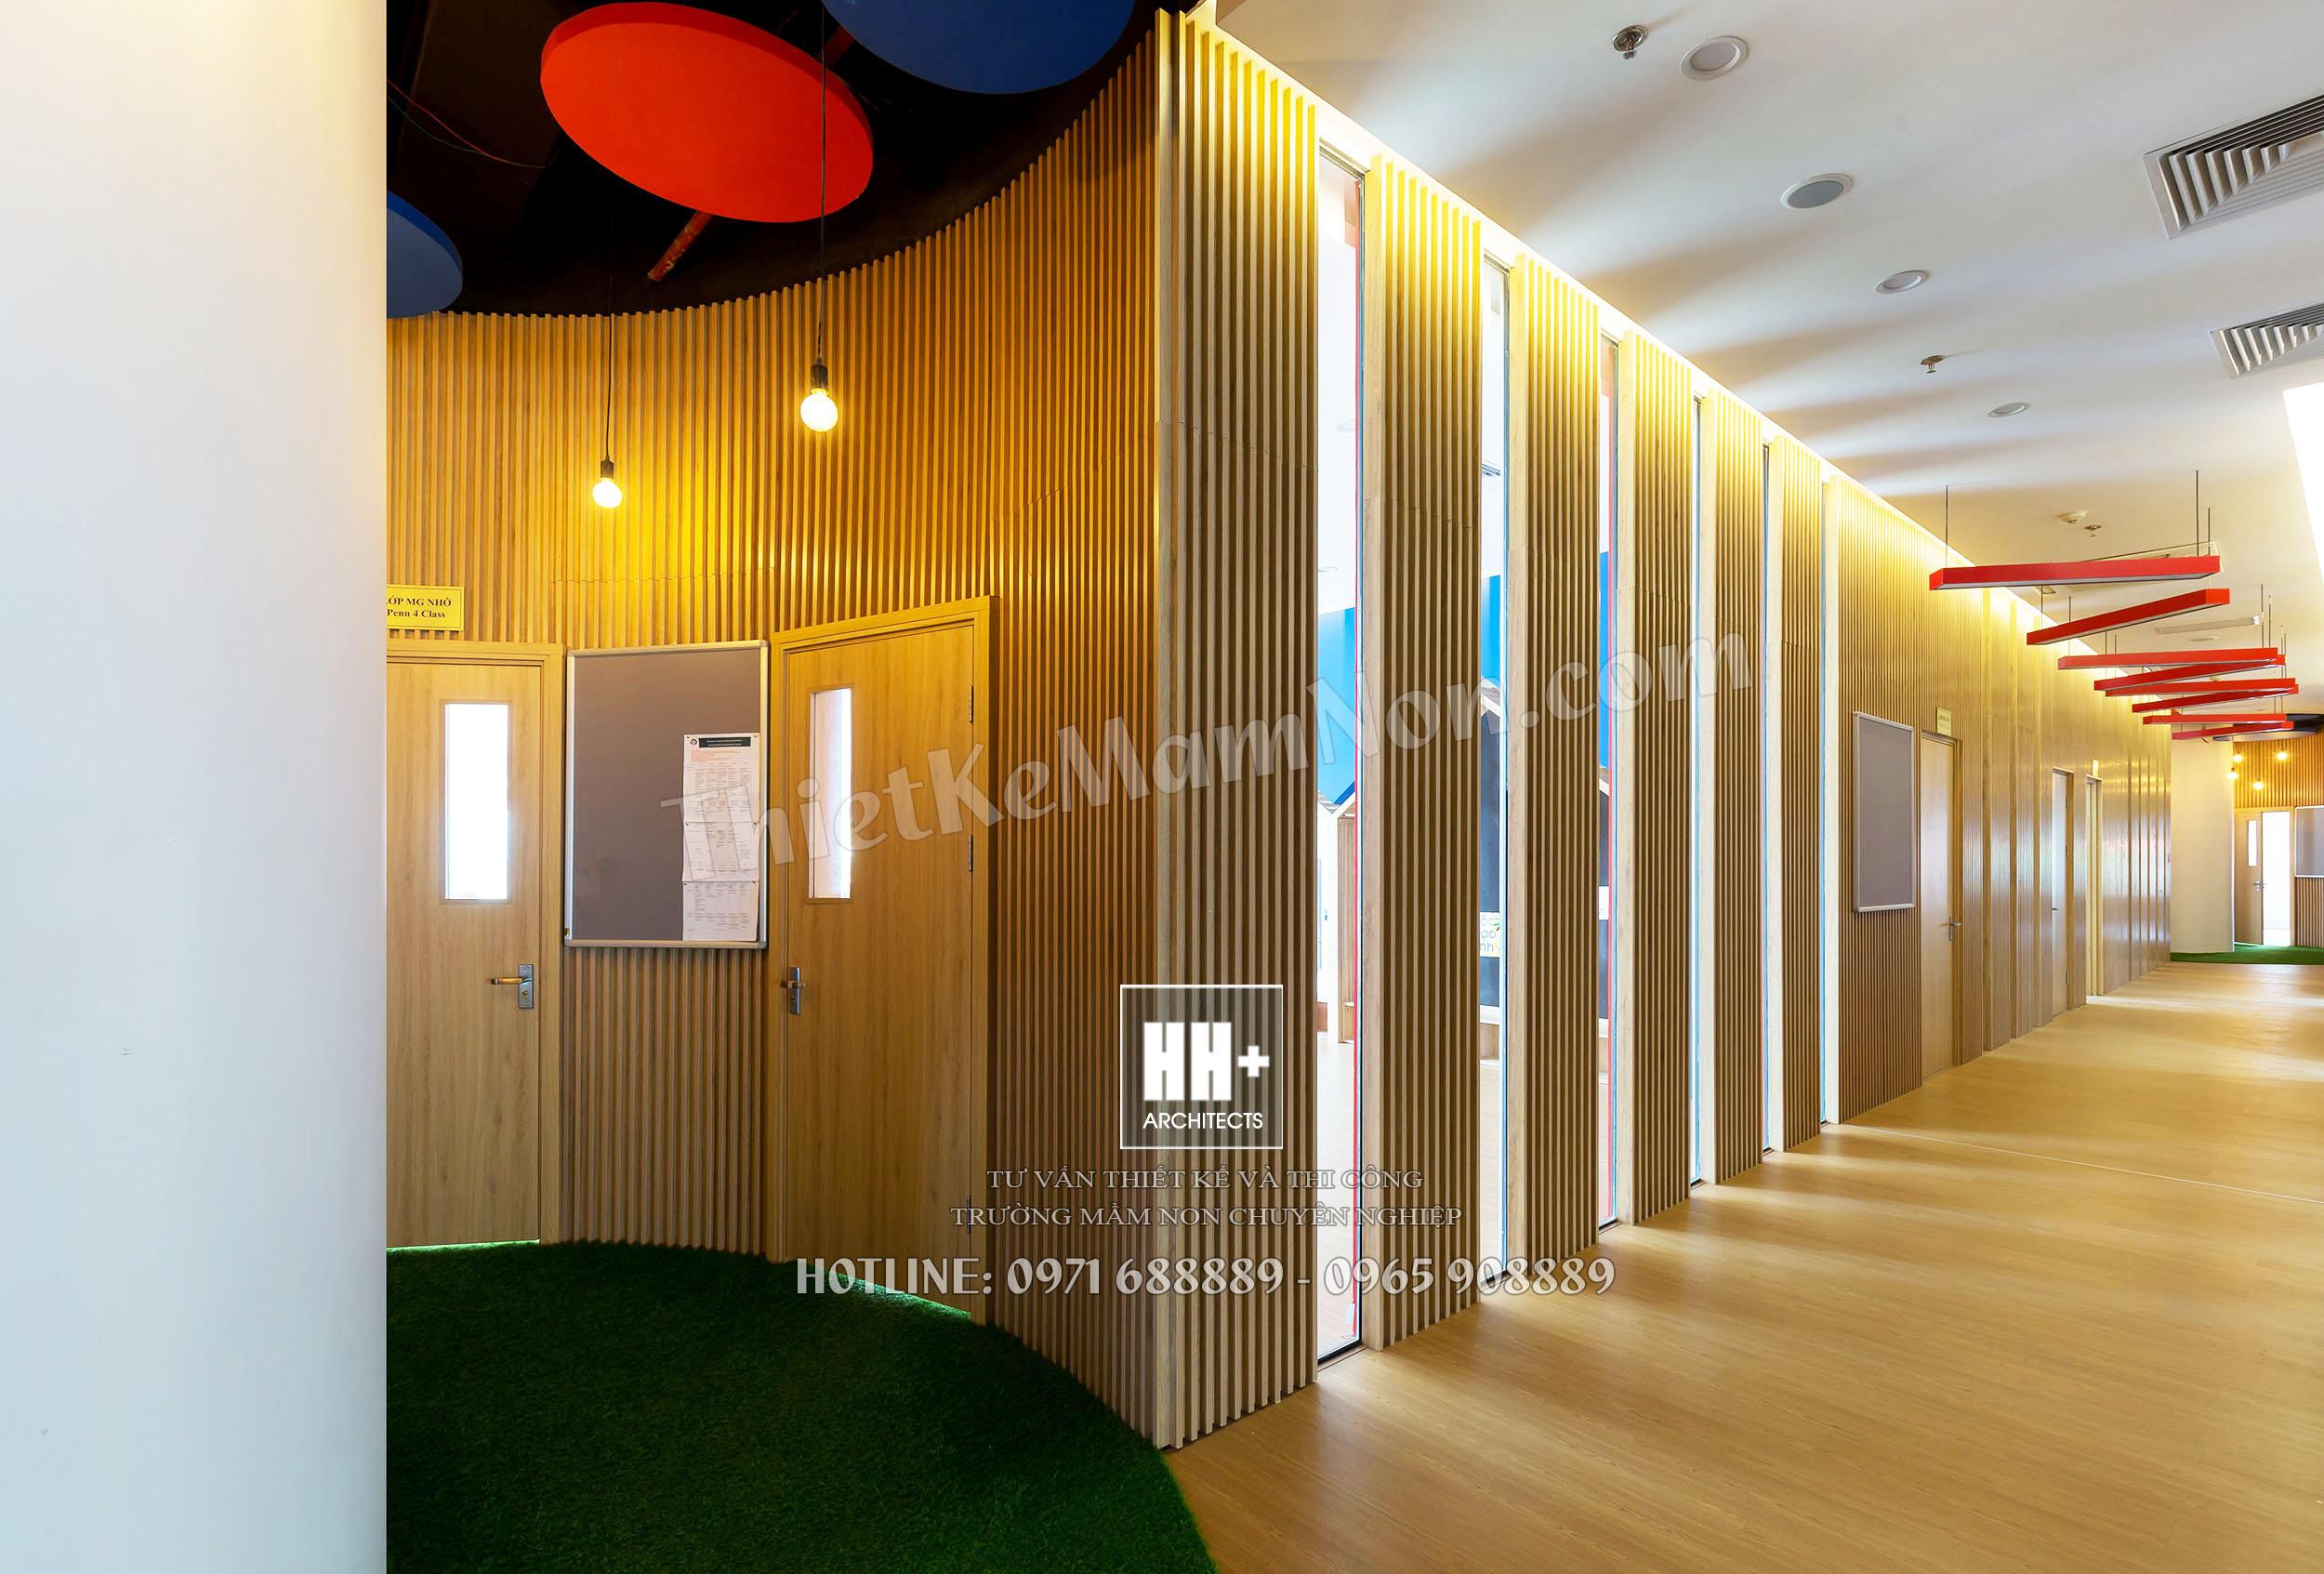 Rosemont_hanhlang_031 thiết kế trường mầm non Thiết kế trường mầm non Quốc Tế MỸ ROSEMONT Rosemont hanhlang 031